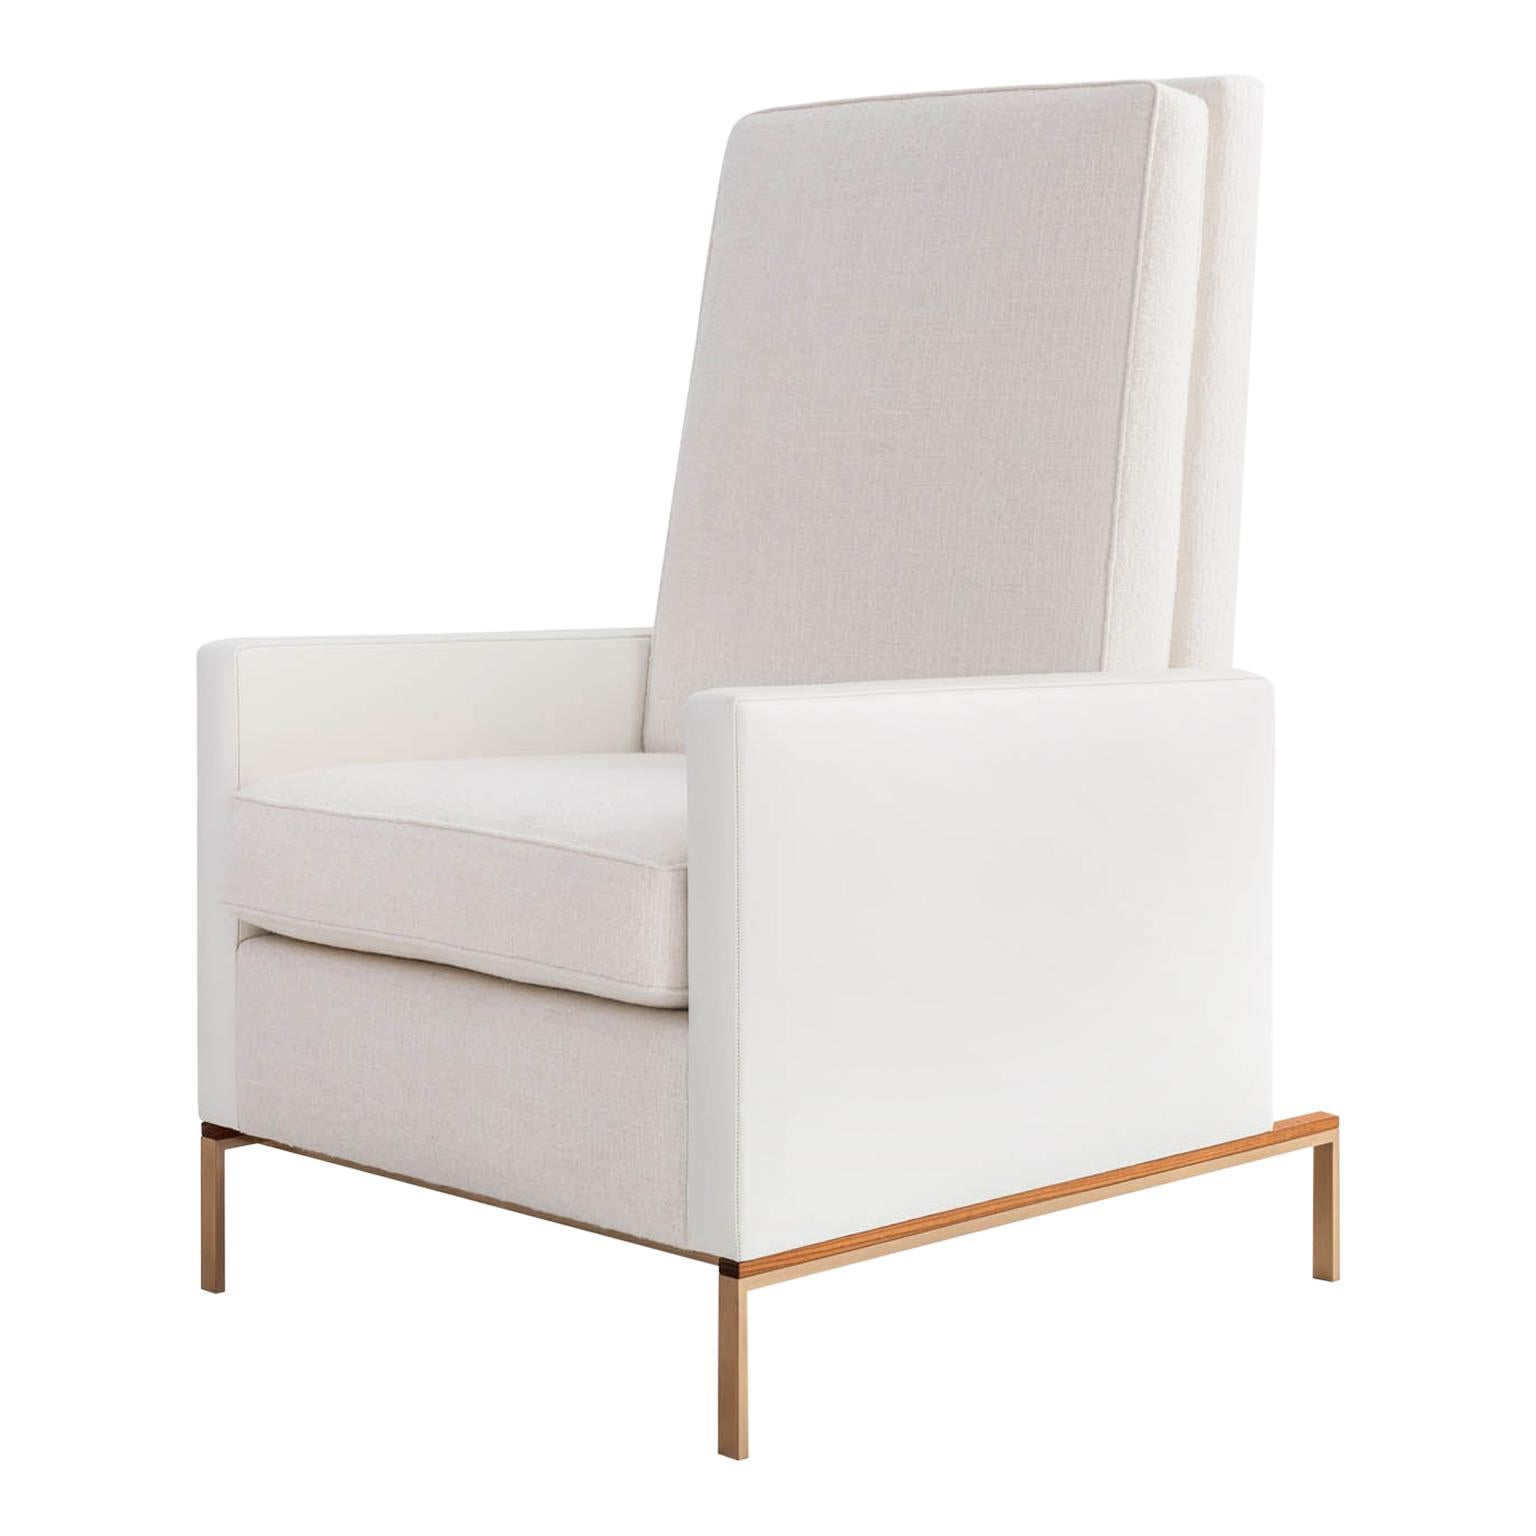 Larkin Armchair, White Linen Weave & Leather, Silicon Bronze, Teak Base COM/COL